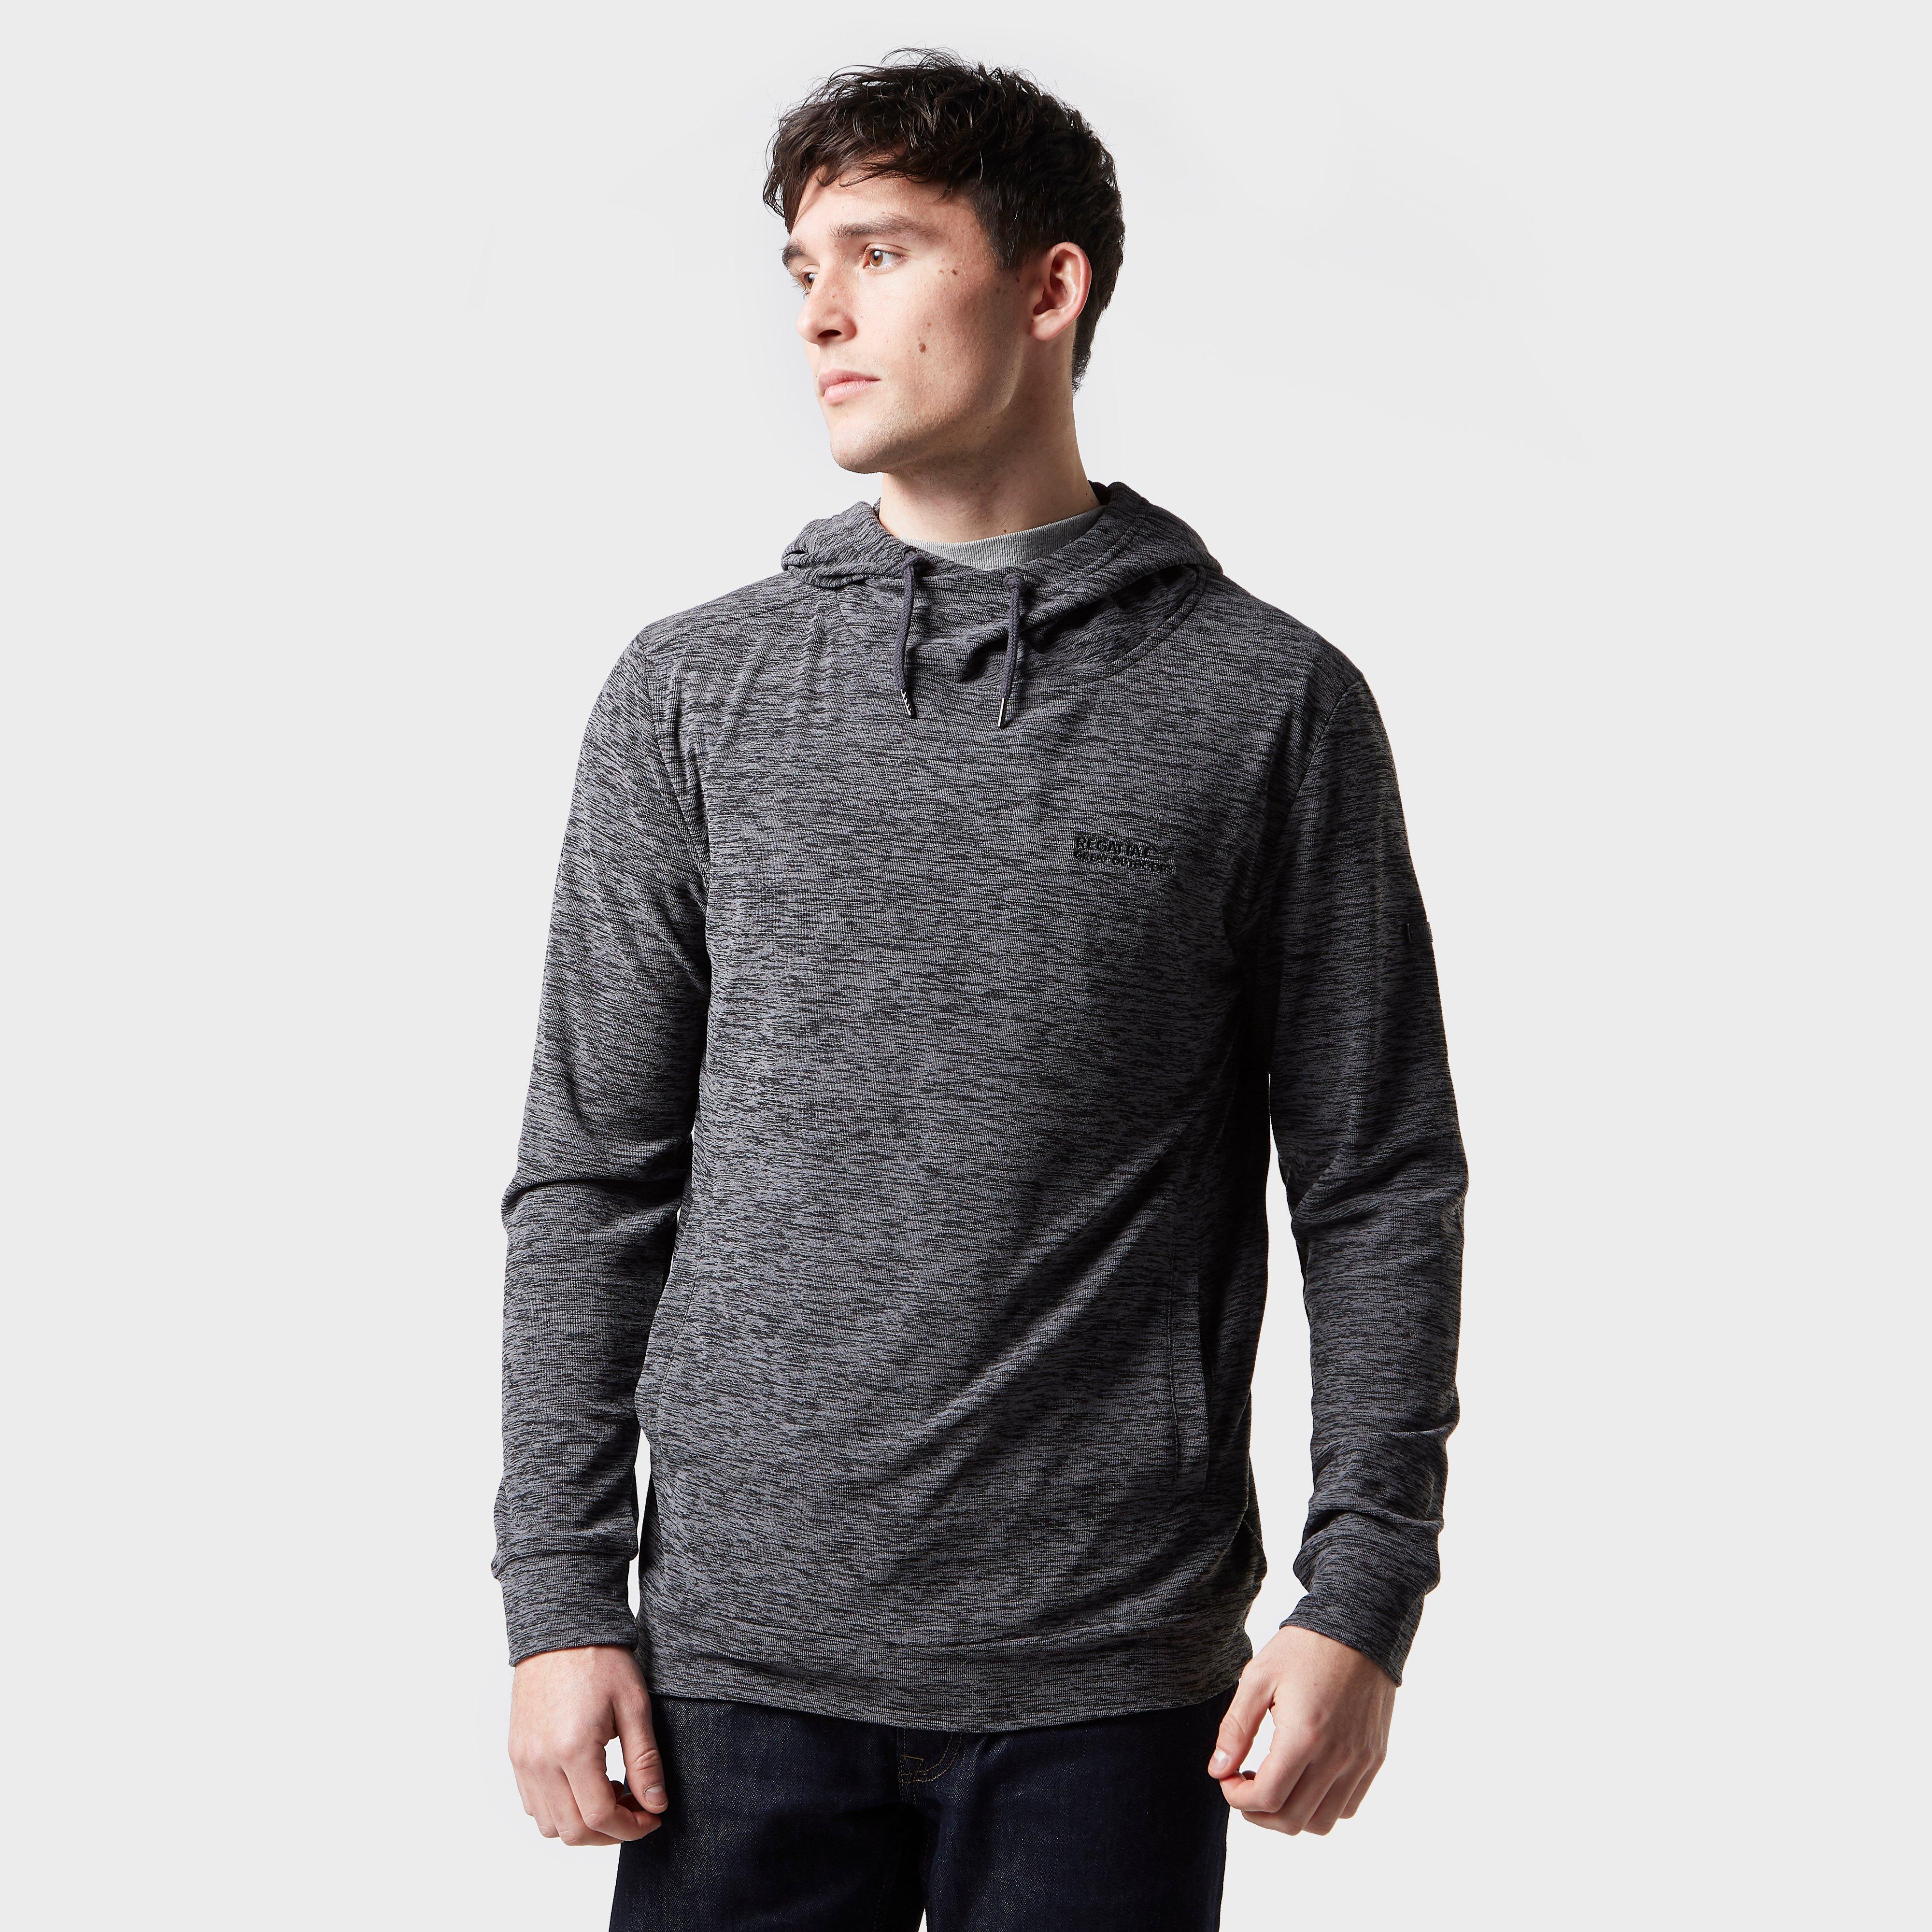 Regatta Regatta Mens Kalmond Hoodie - Grey, Grey